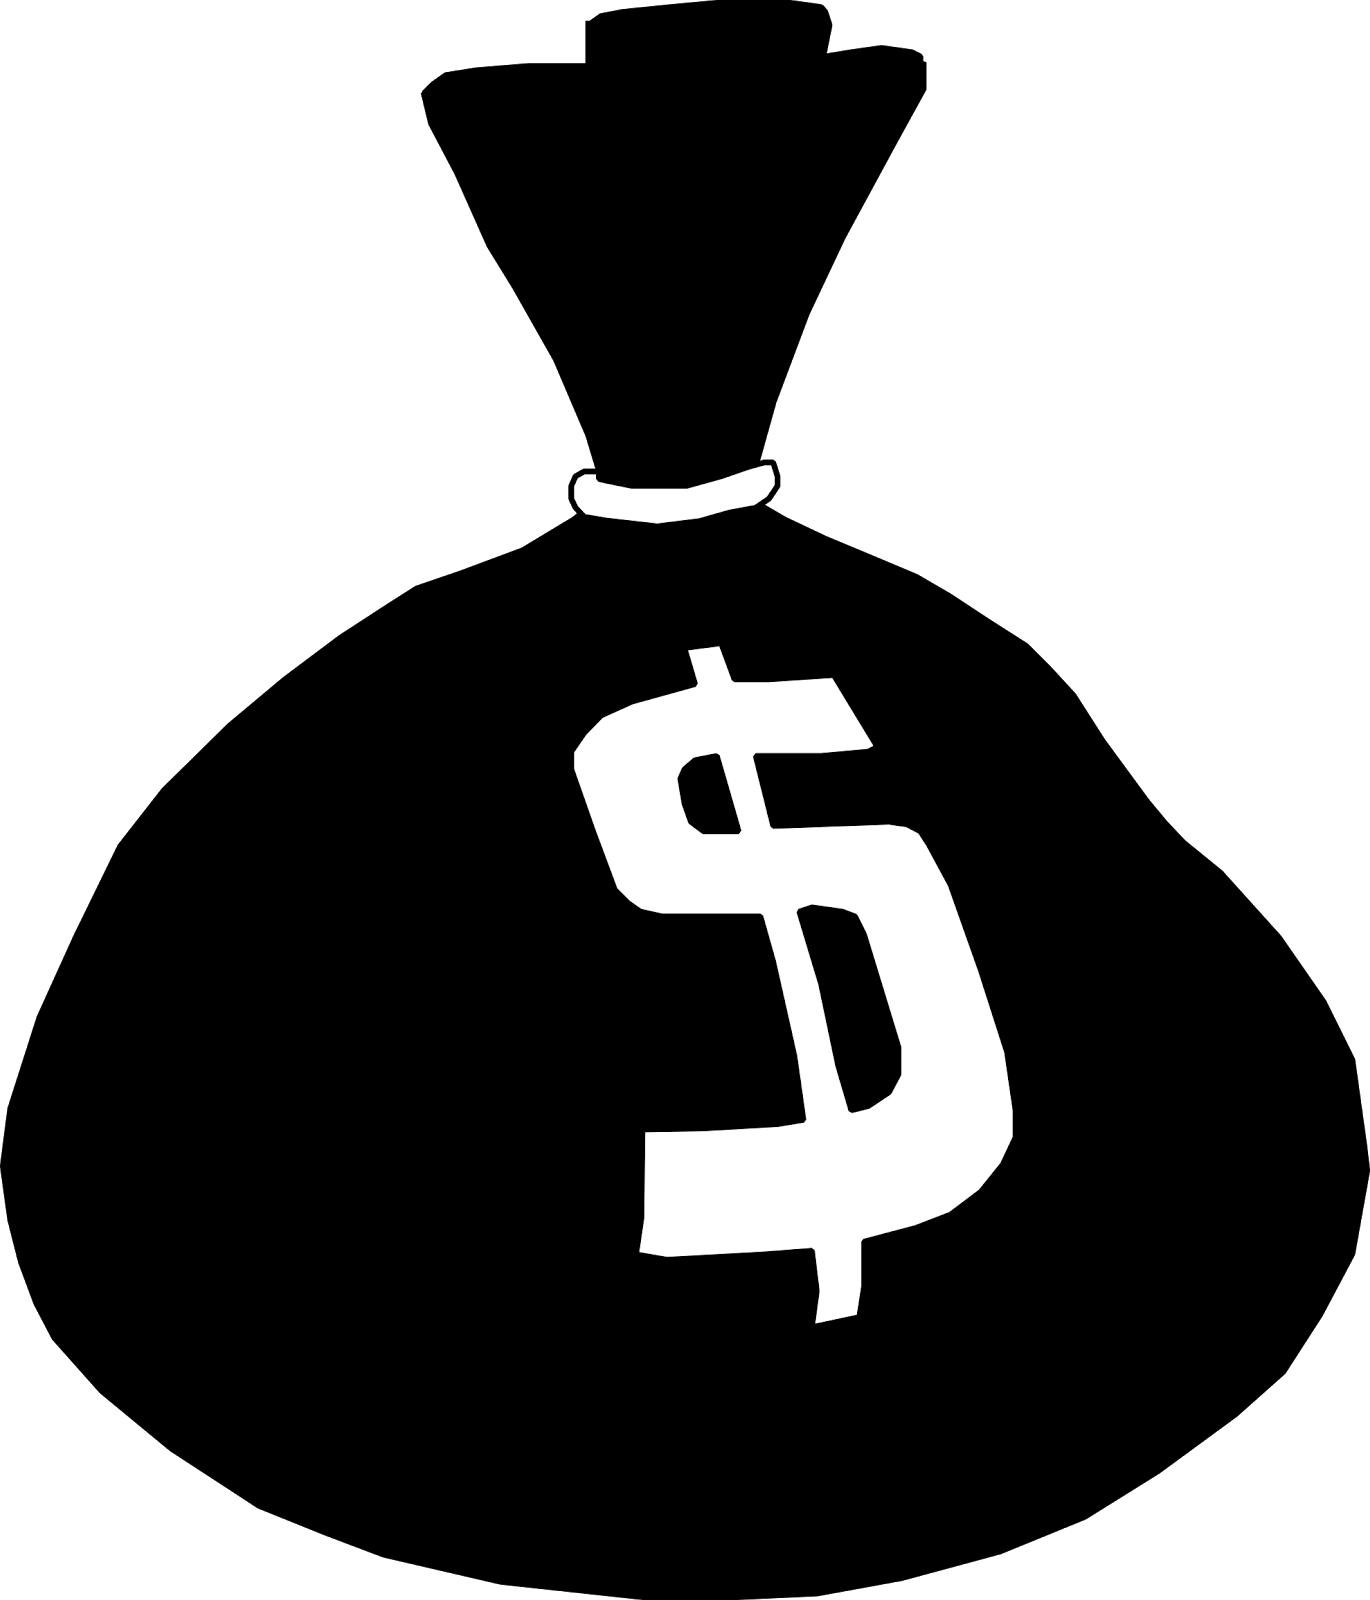 Scholarships clipart group abetterfloristcom. Money clip art silhouette